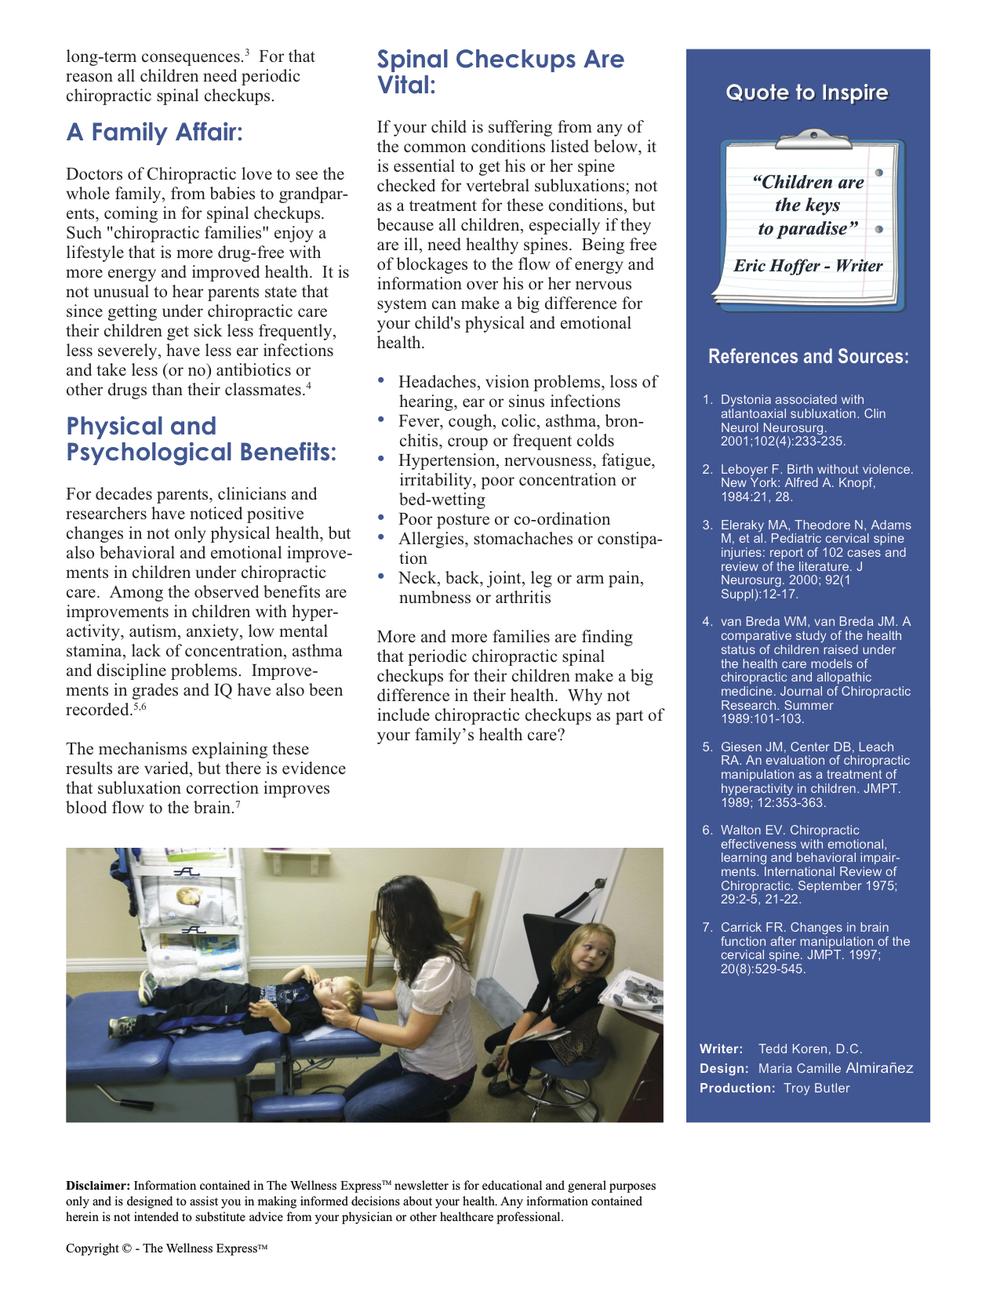 Weekly Newsletter: Healthier Children with Chiropractic